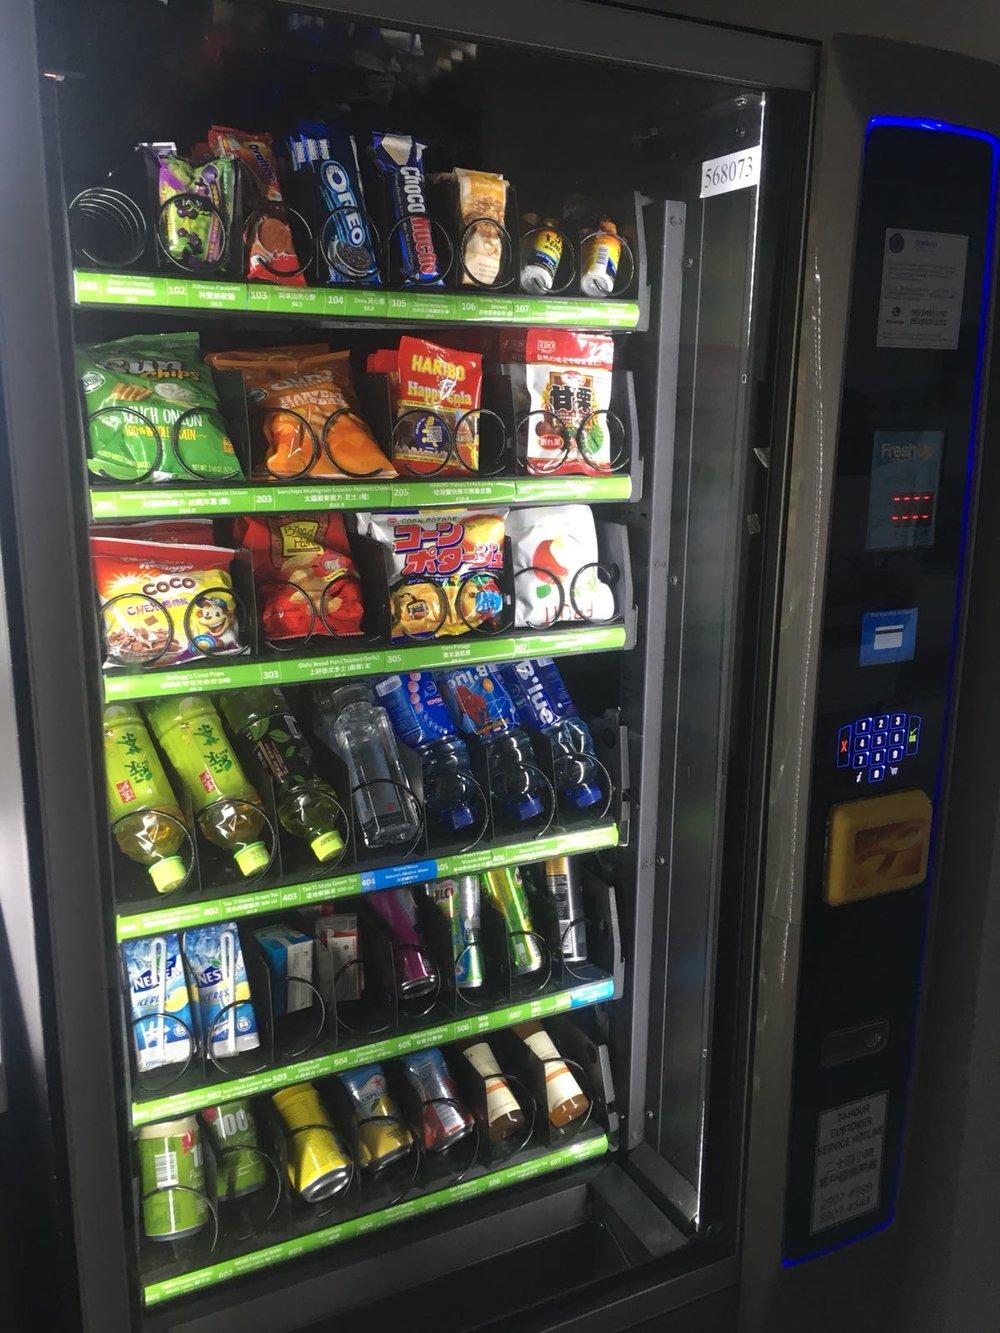 FreshUp,自動售賣機,自動販賣機,零食,飲品,方便,快捷,智能,學校,大學,香港中文大學